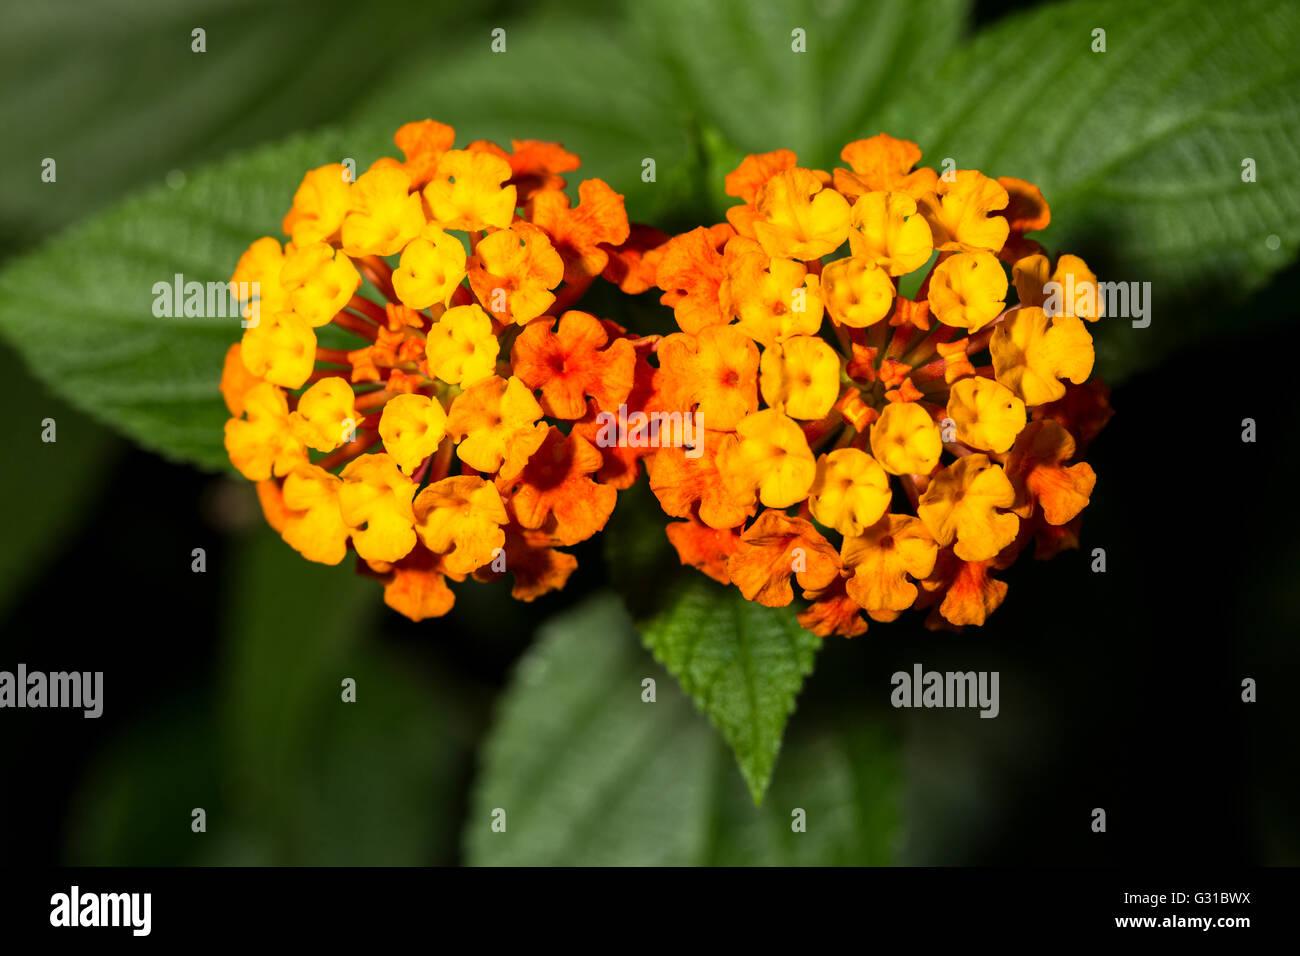 Closeup of two orange flowers of Lantana camara, known as wild sage and tickberry Stock Photo